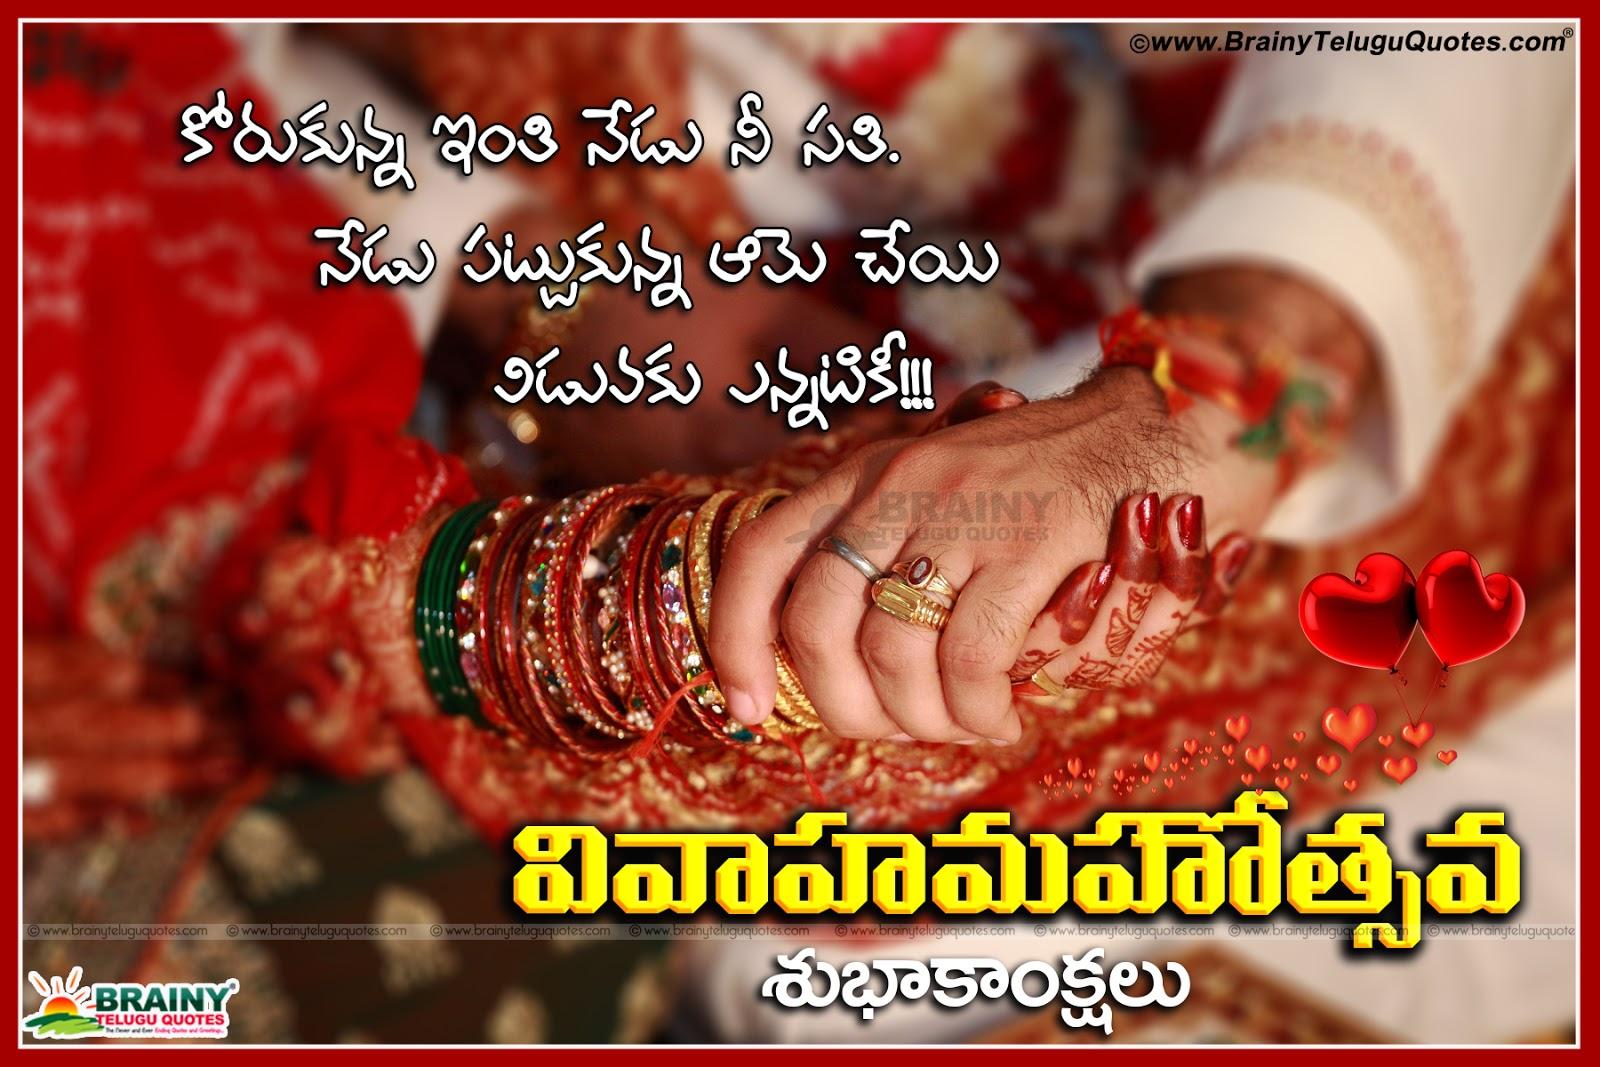 Telugu Marriage Wishes Quotes